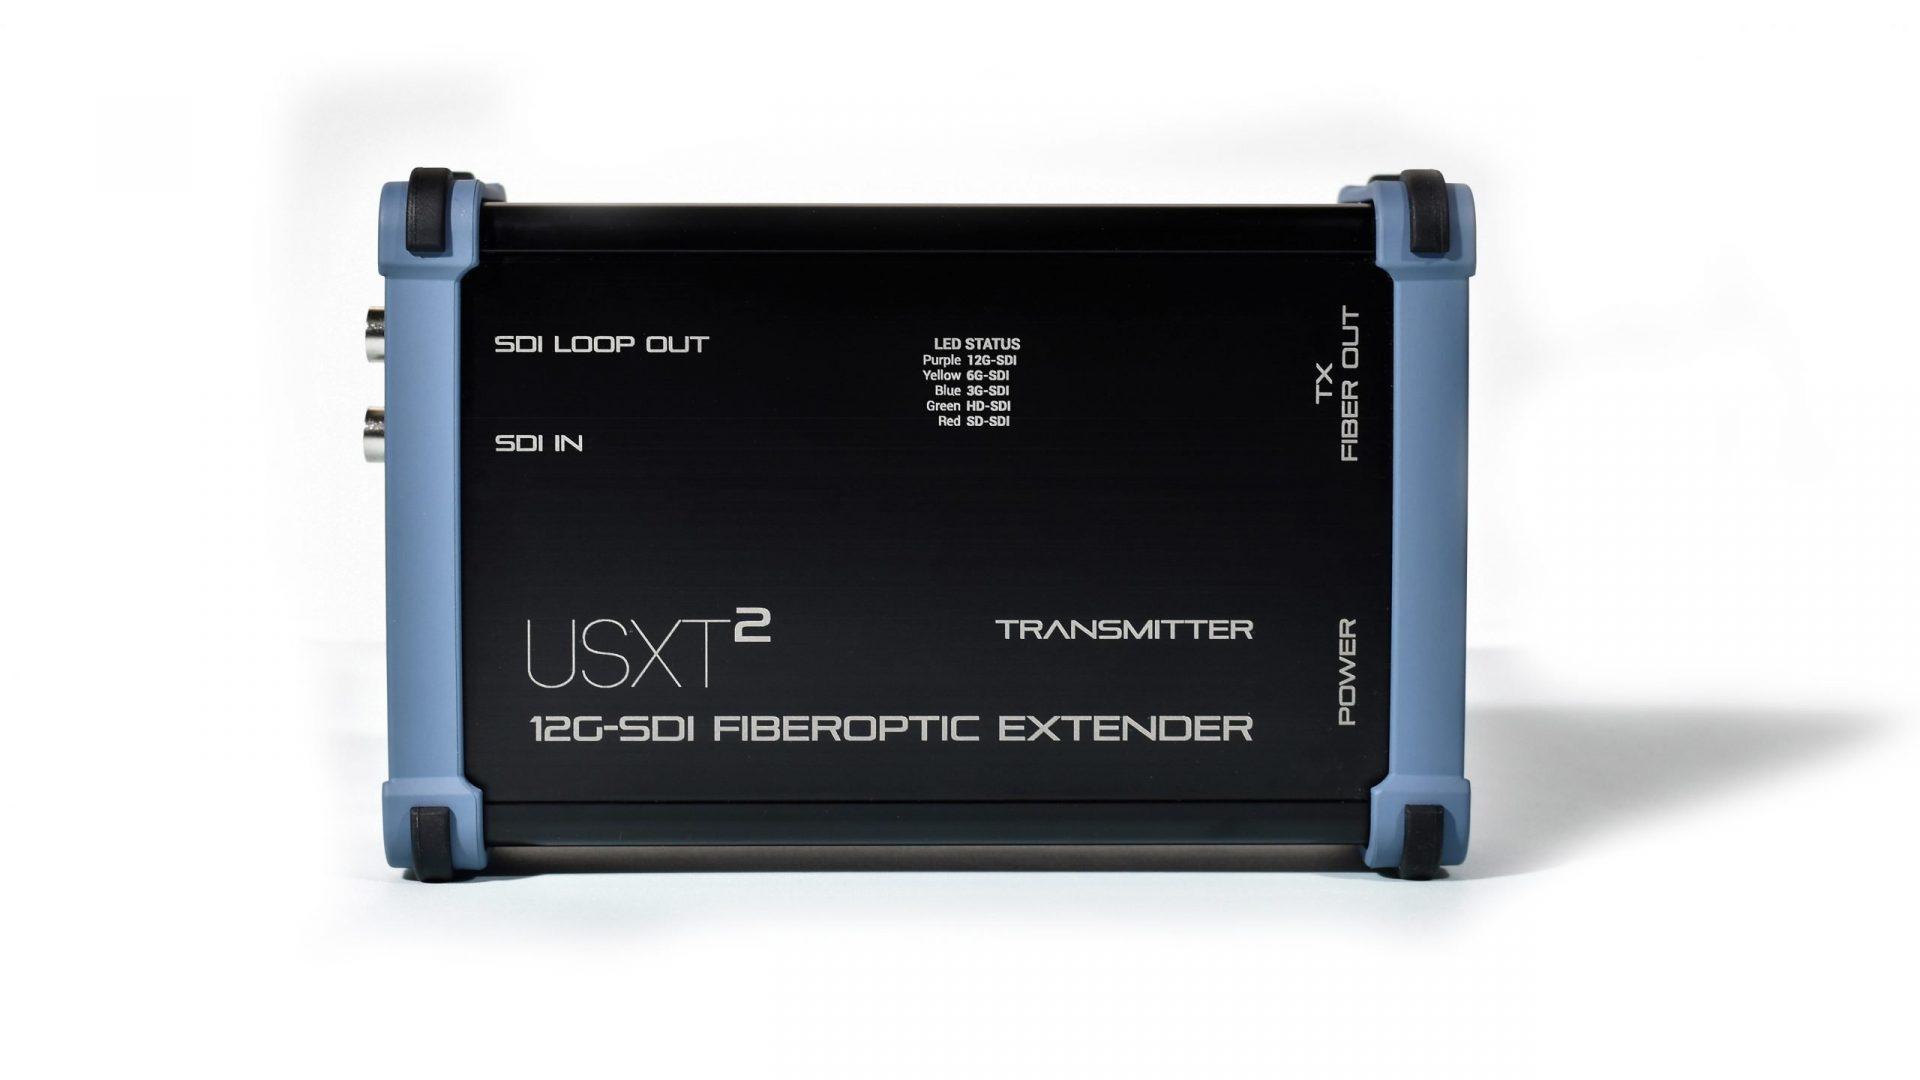 USXT² - 12G-SDI Fiber Optic Extender